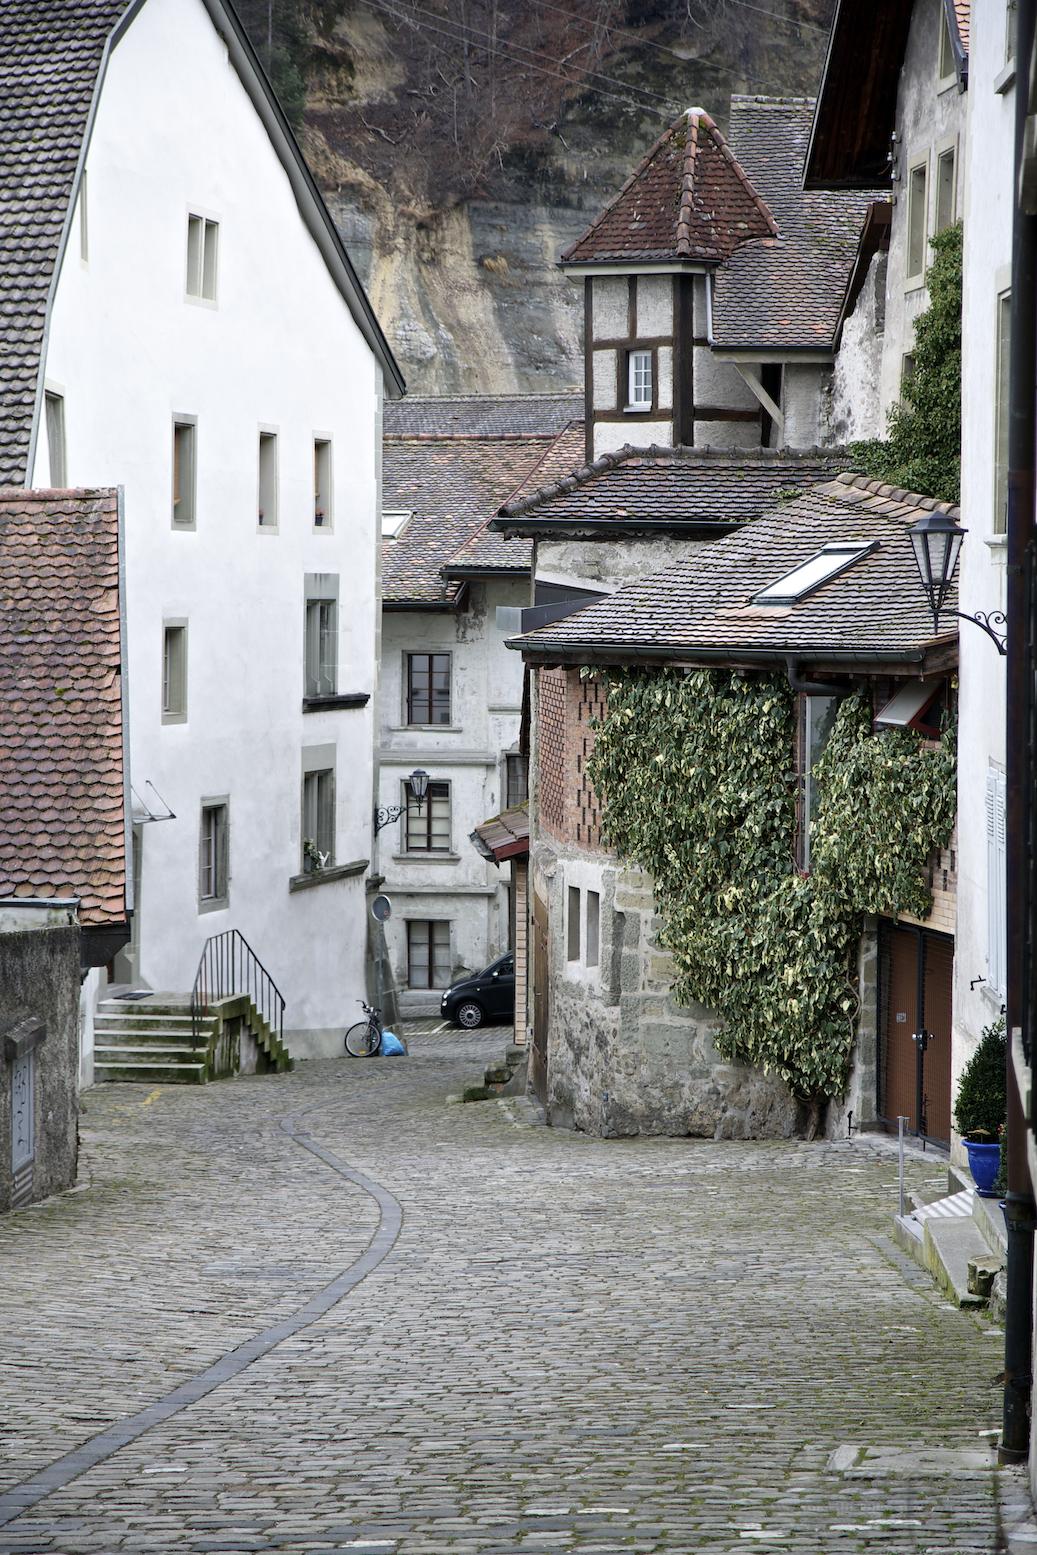 Basse-ville de Fribourg (2).jpg